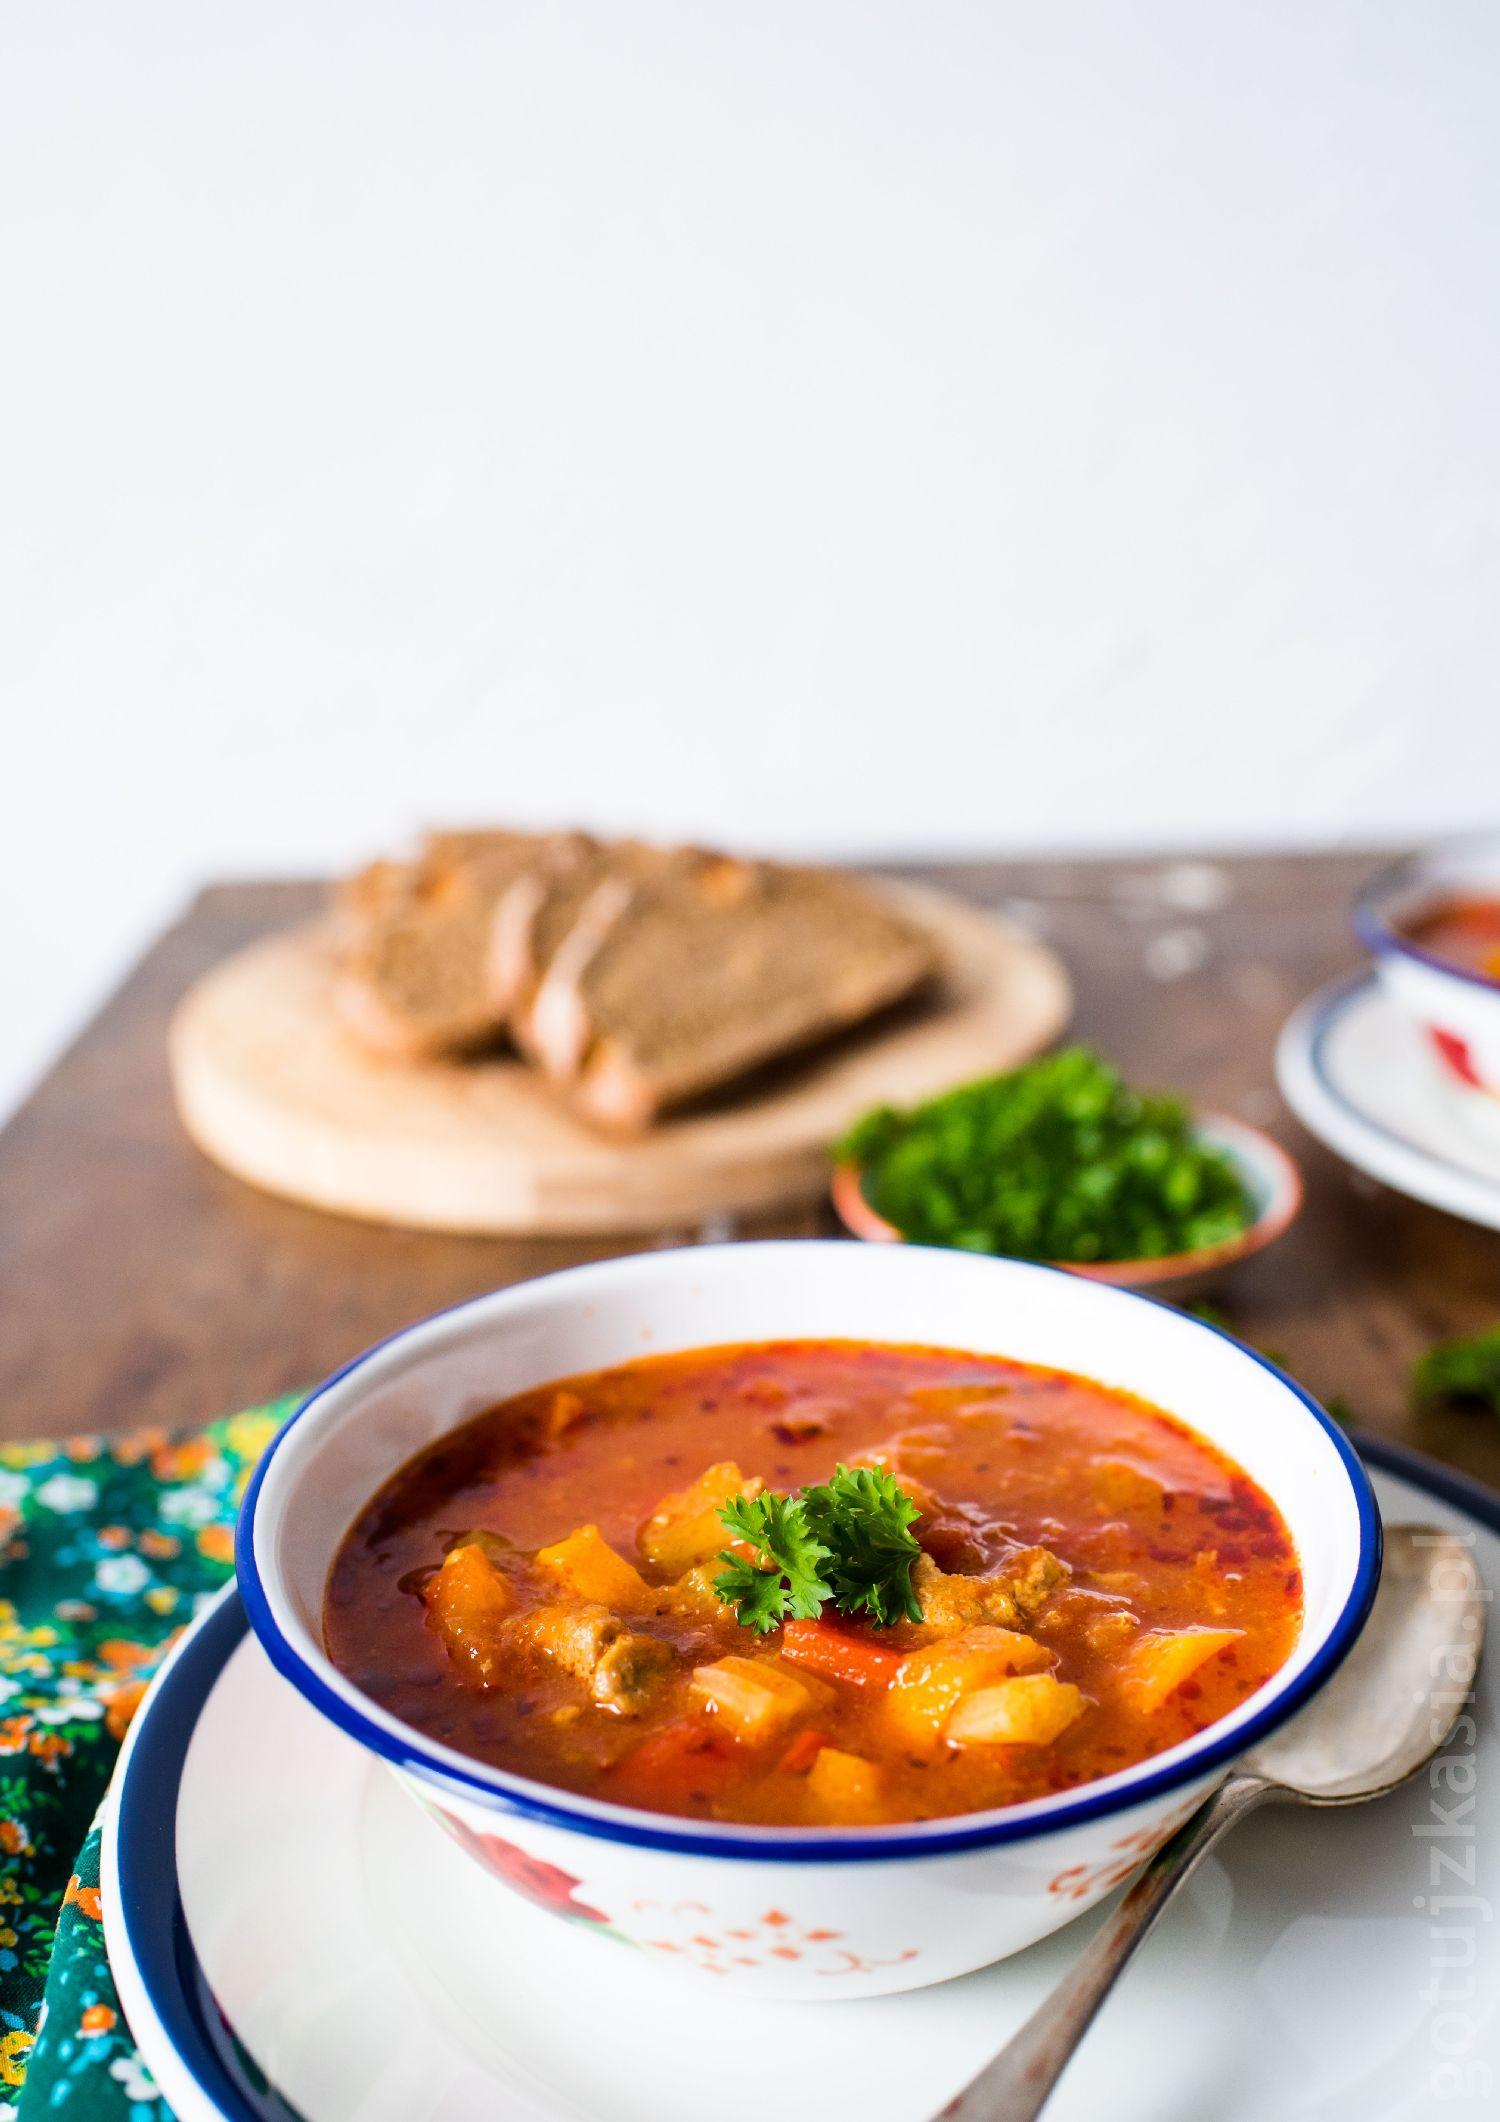 zupa gulaszowa 2